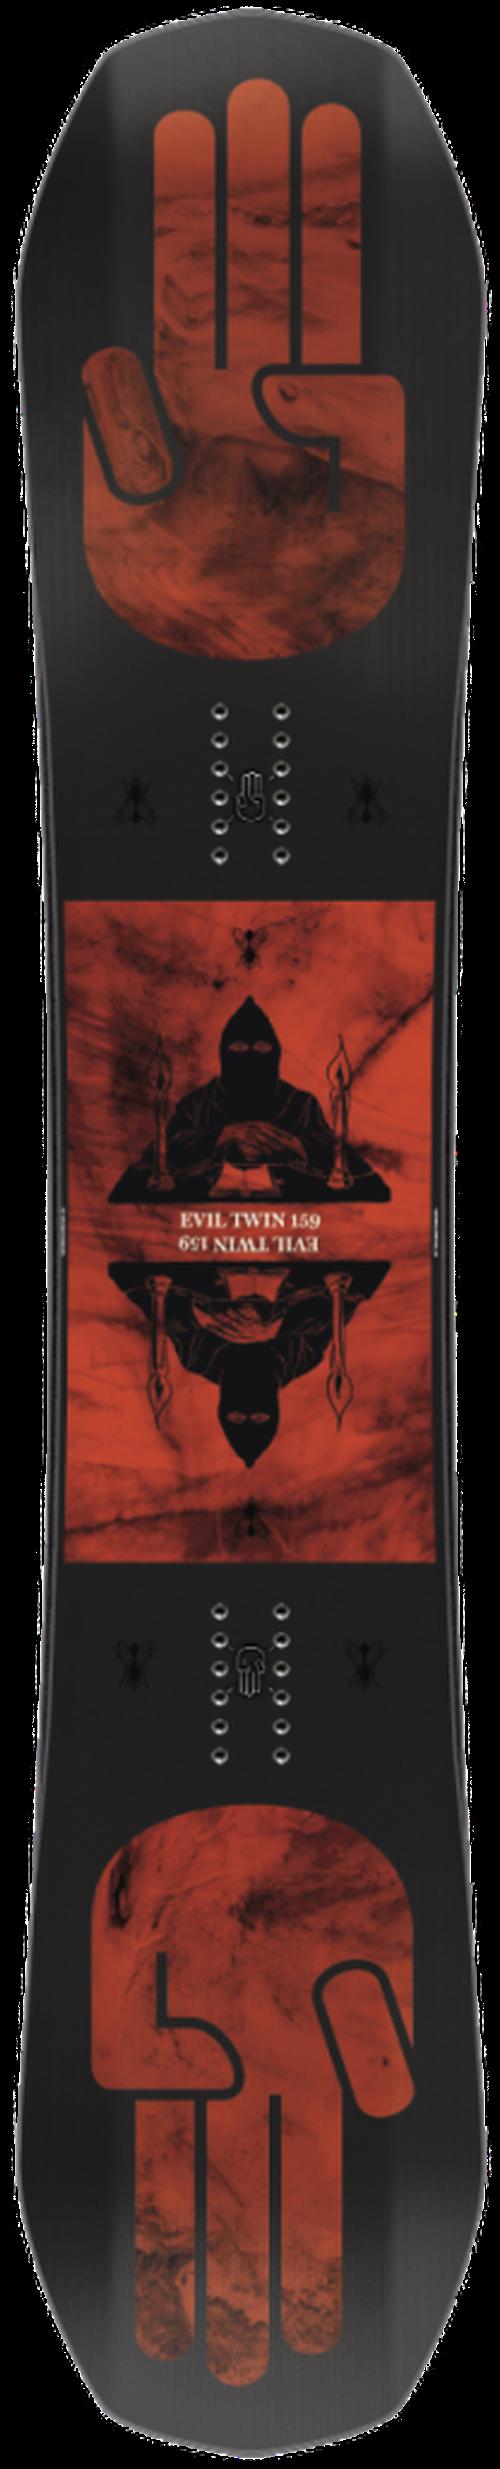 【BATALEON-EVIL TWIN 154】1ヶ月レンタルプラン